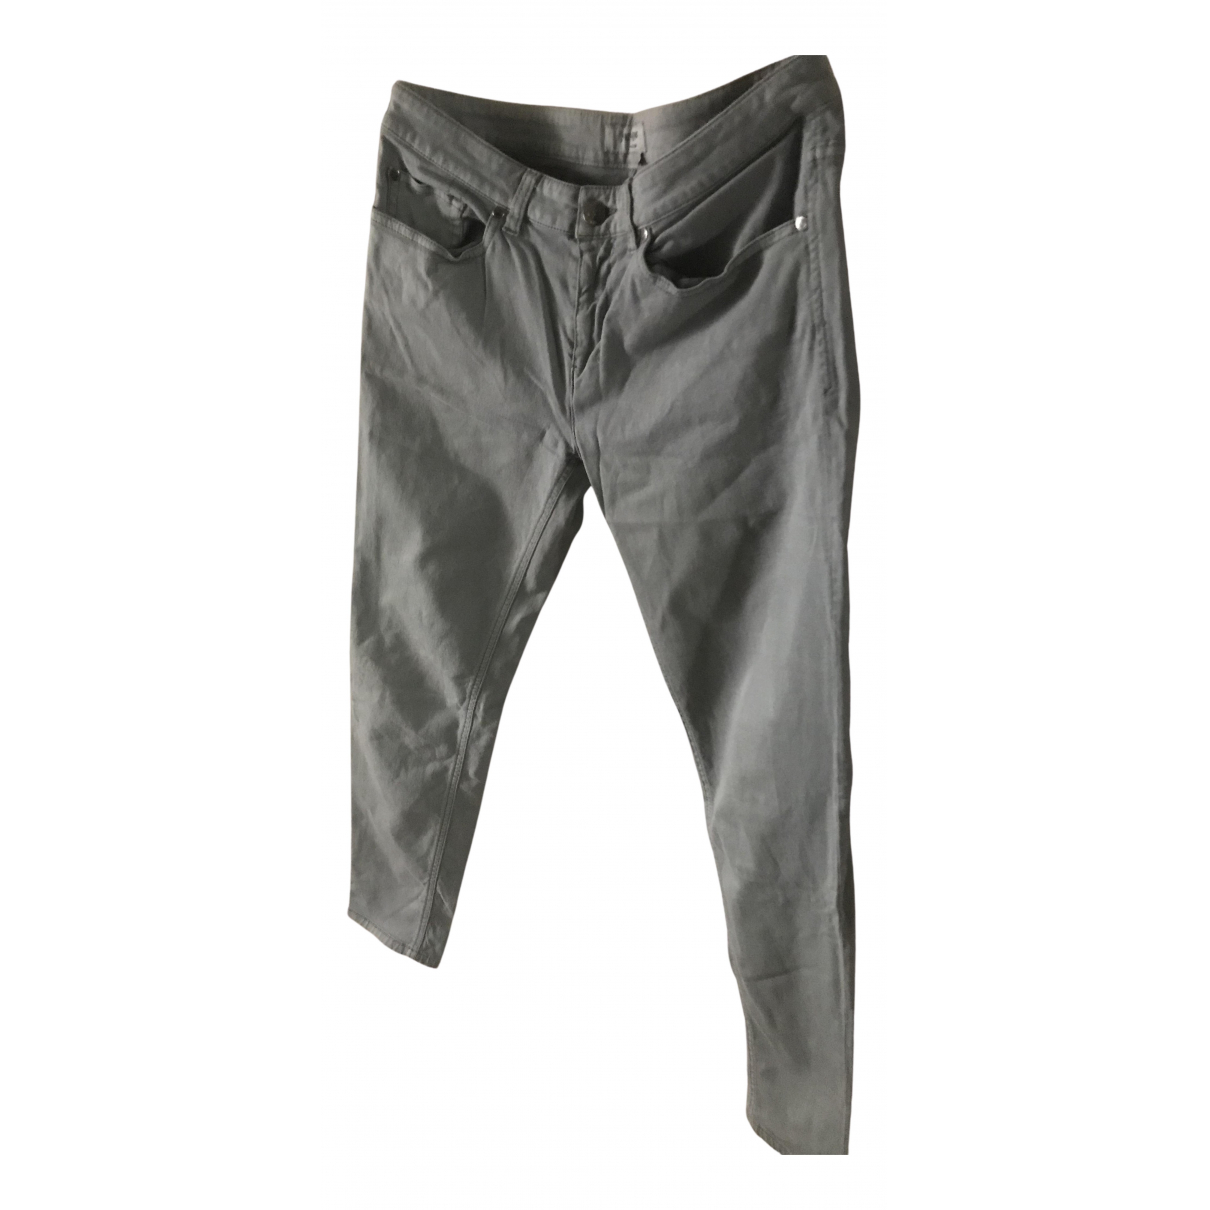 Yves Saint Laurent N Cotton Trousers for Women 40 FR